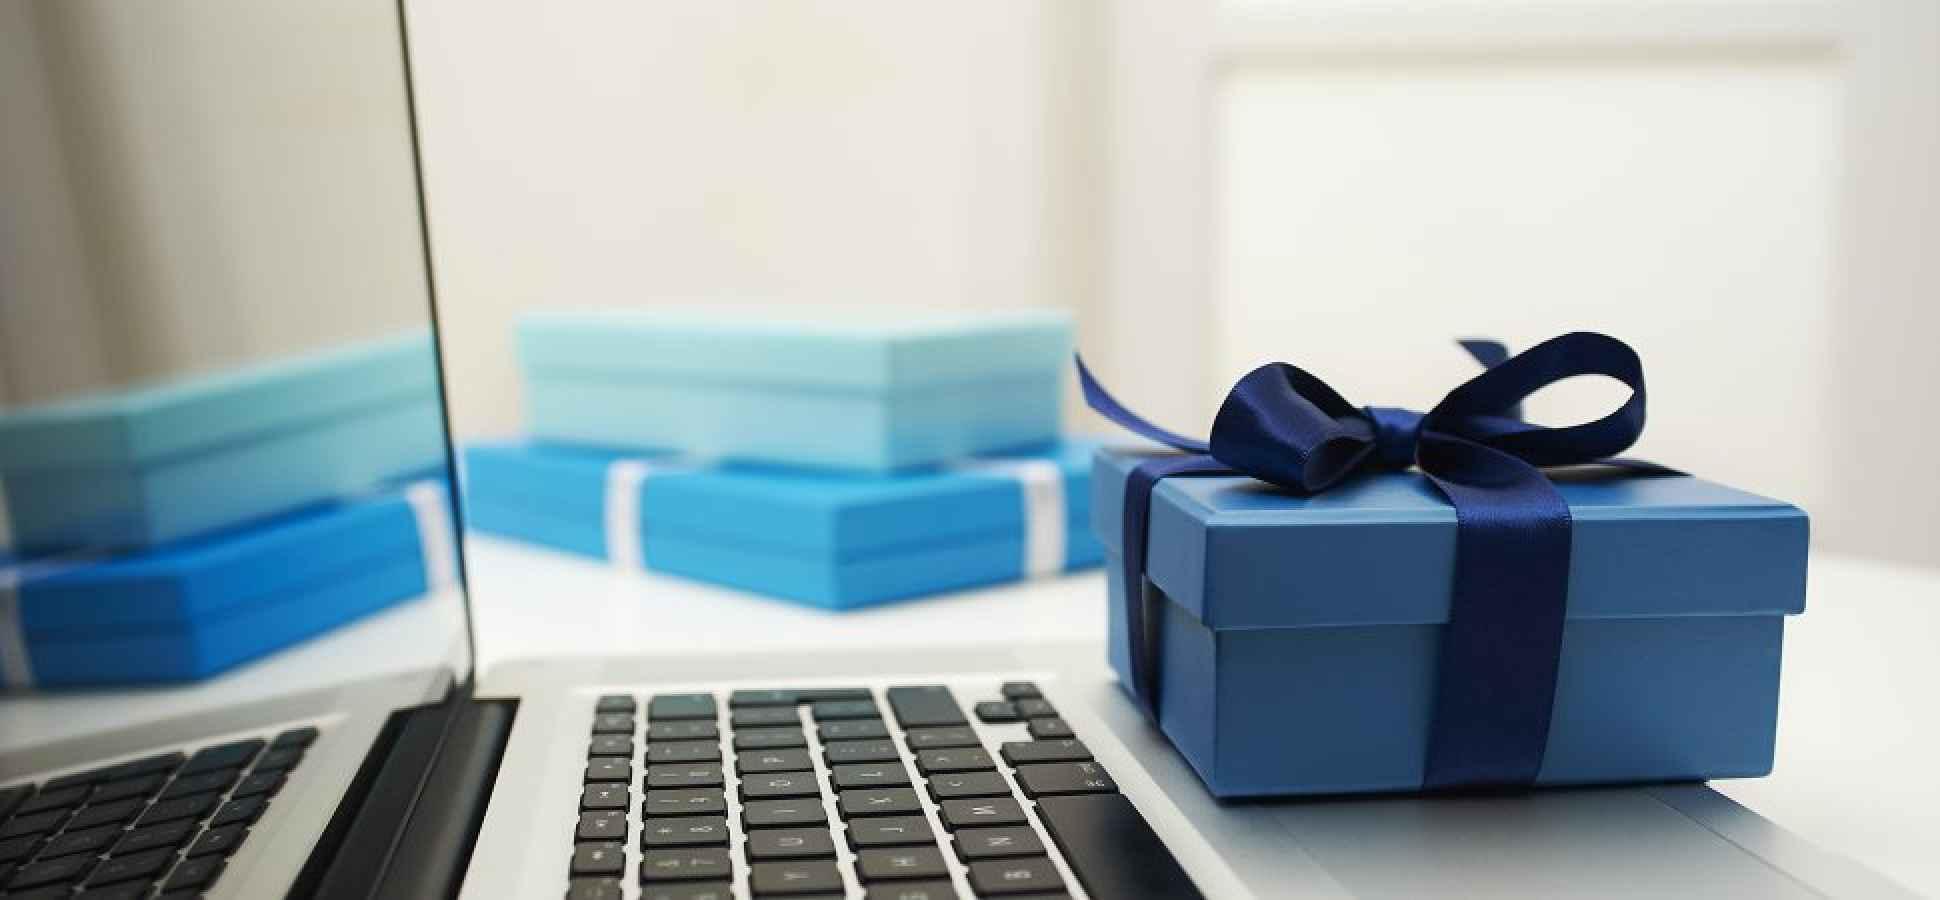 Need a Last-Minute Gift? Think Digital